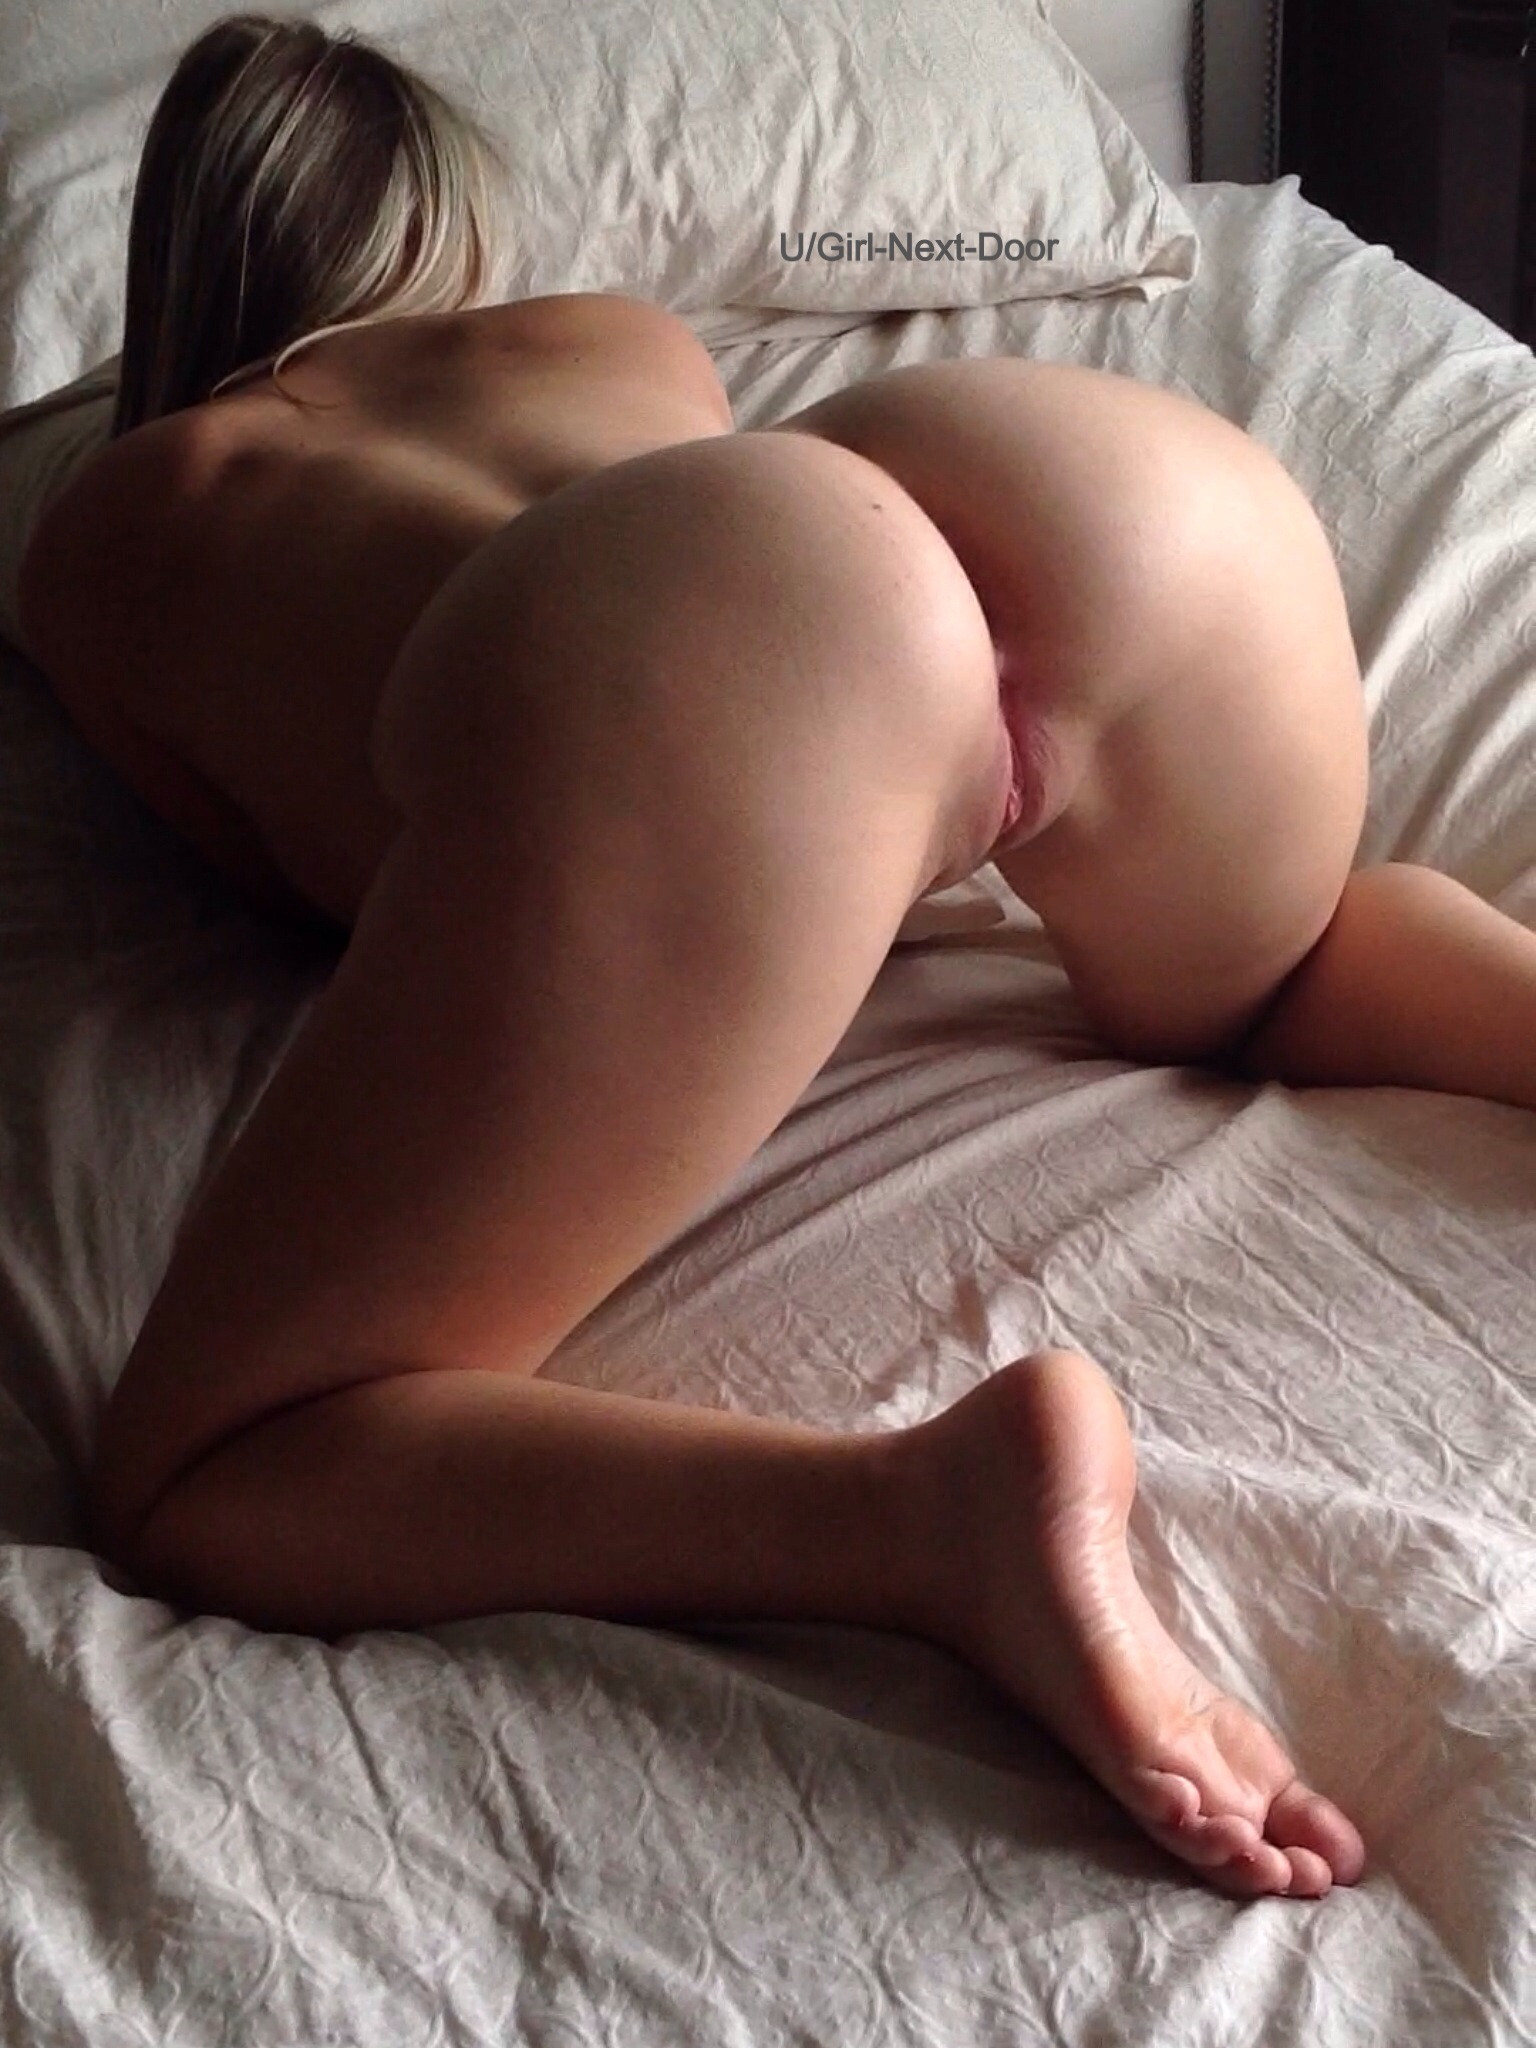 Nude girl face down ass up sex